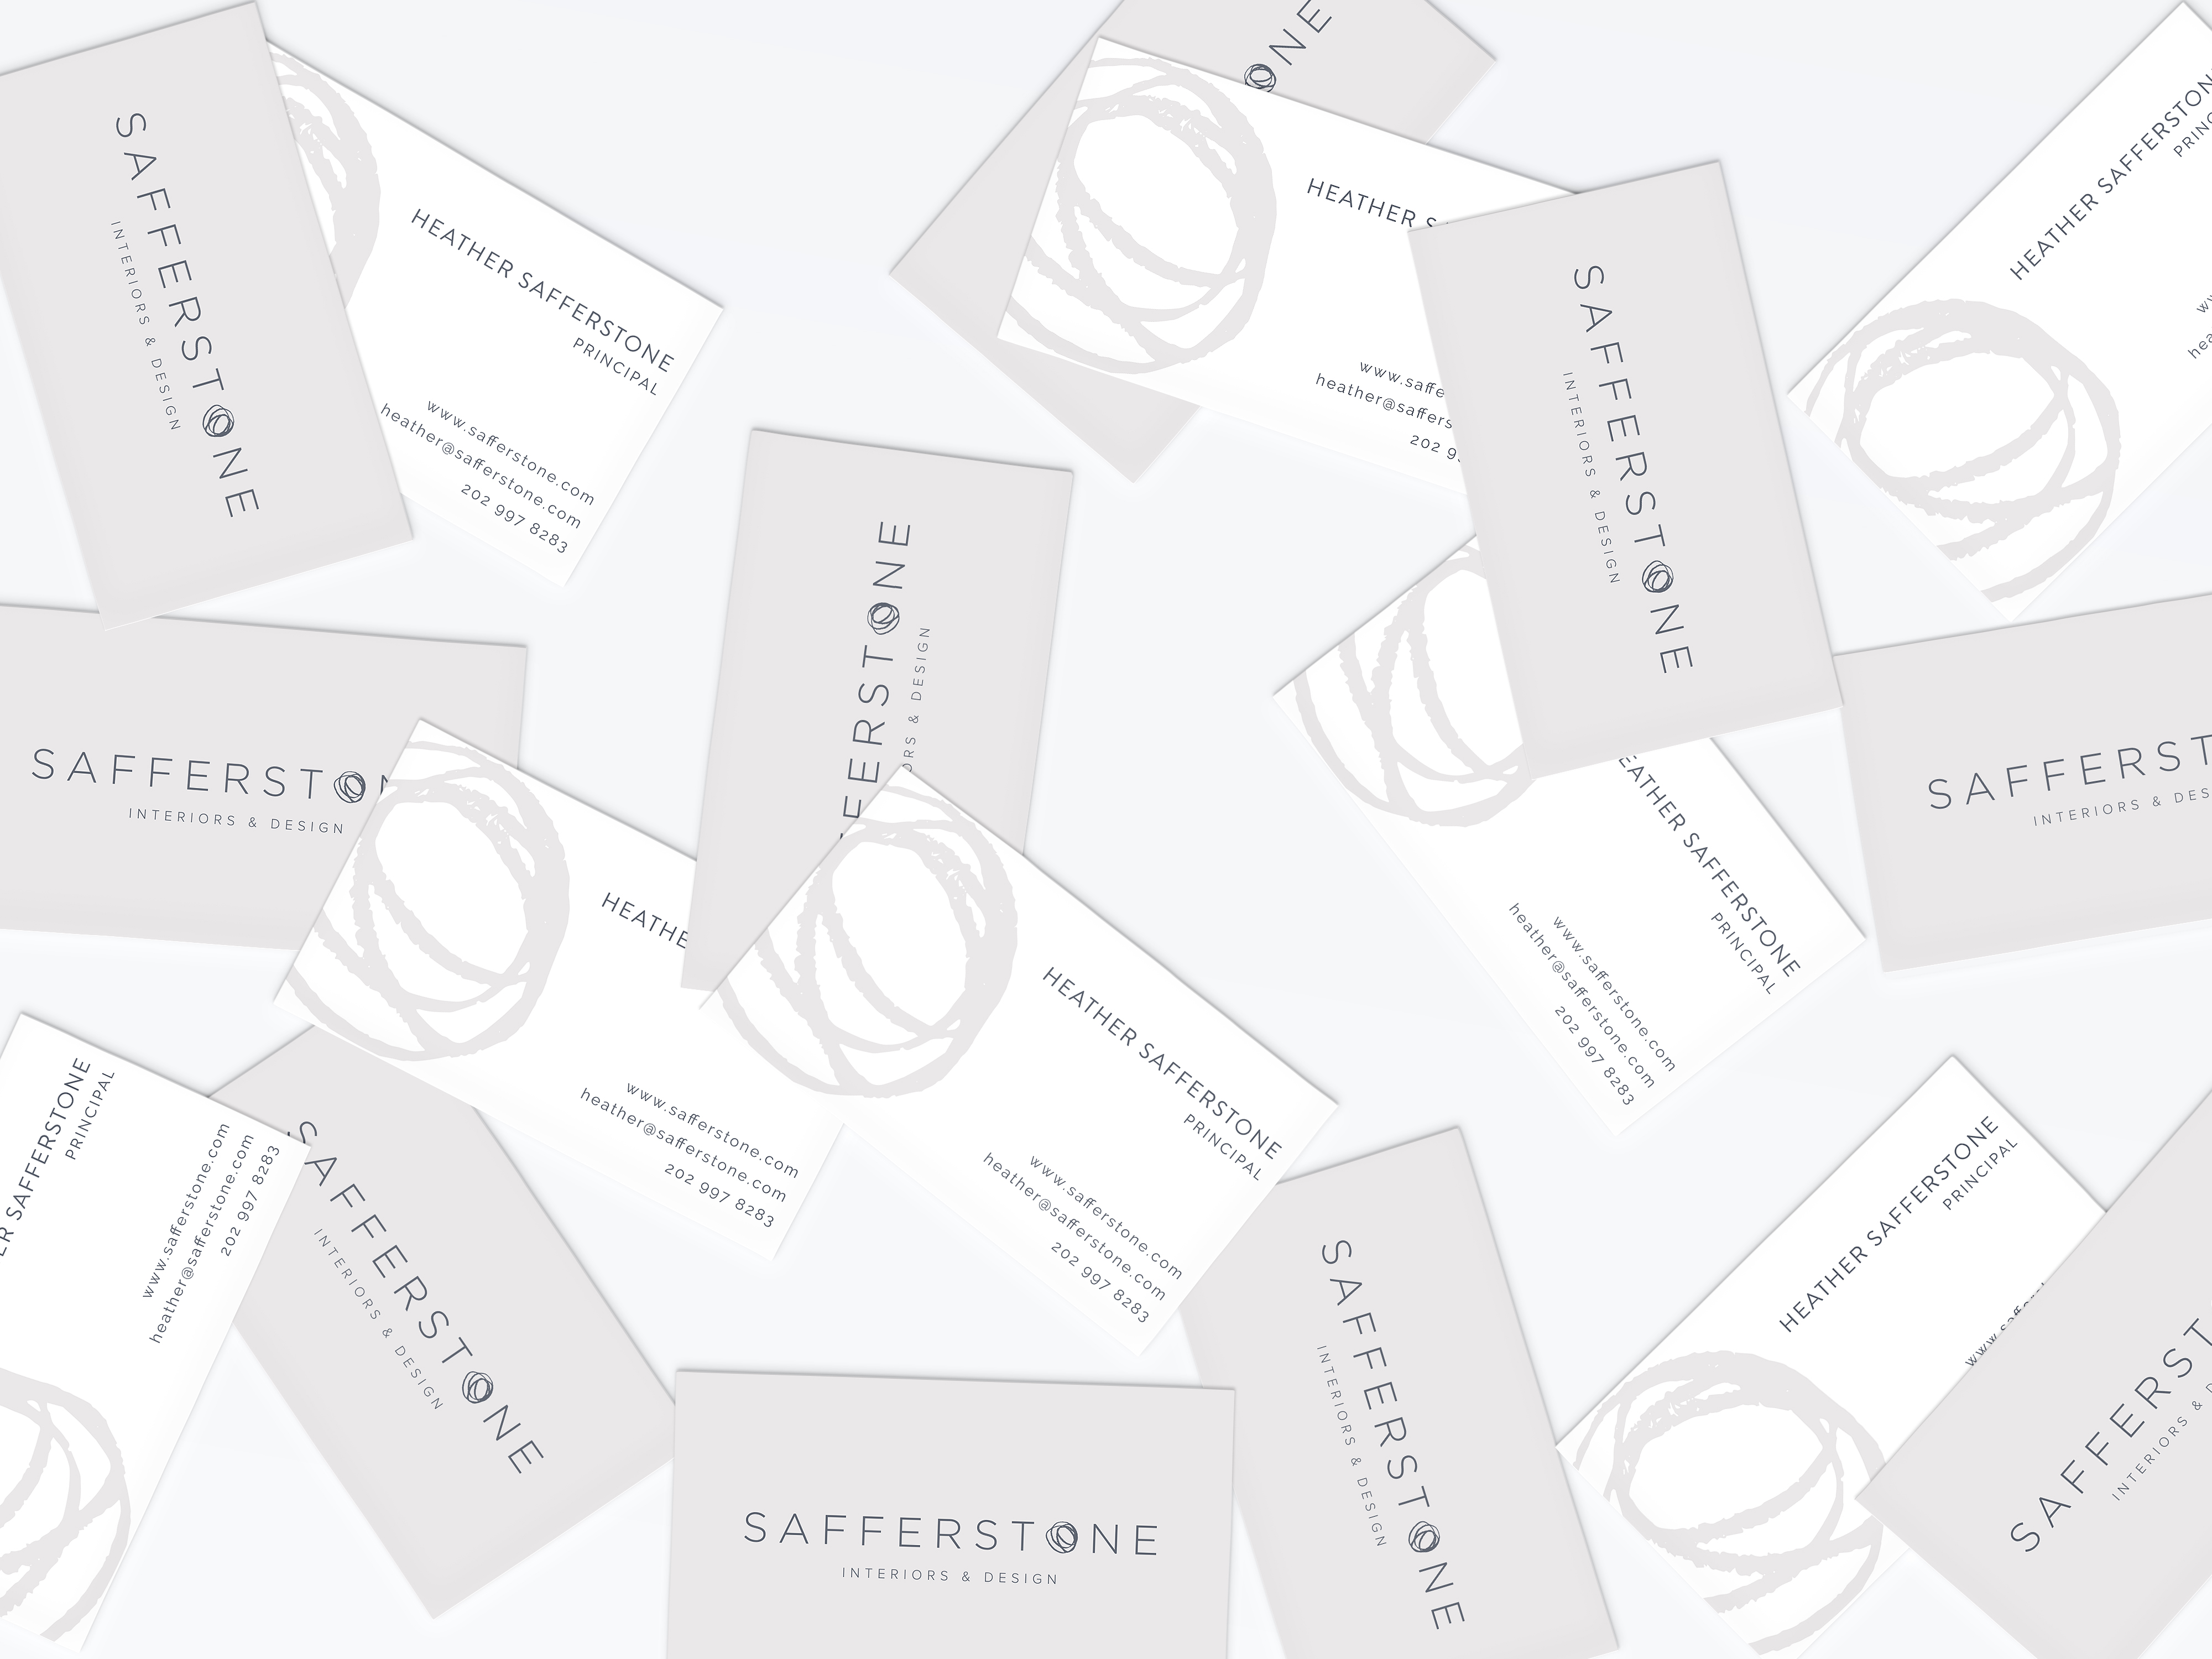 Safferstone Noirve Design